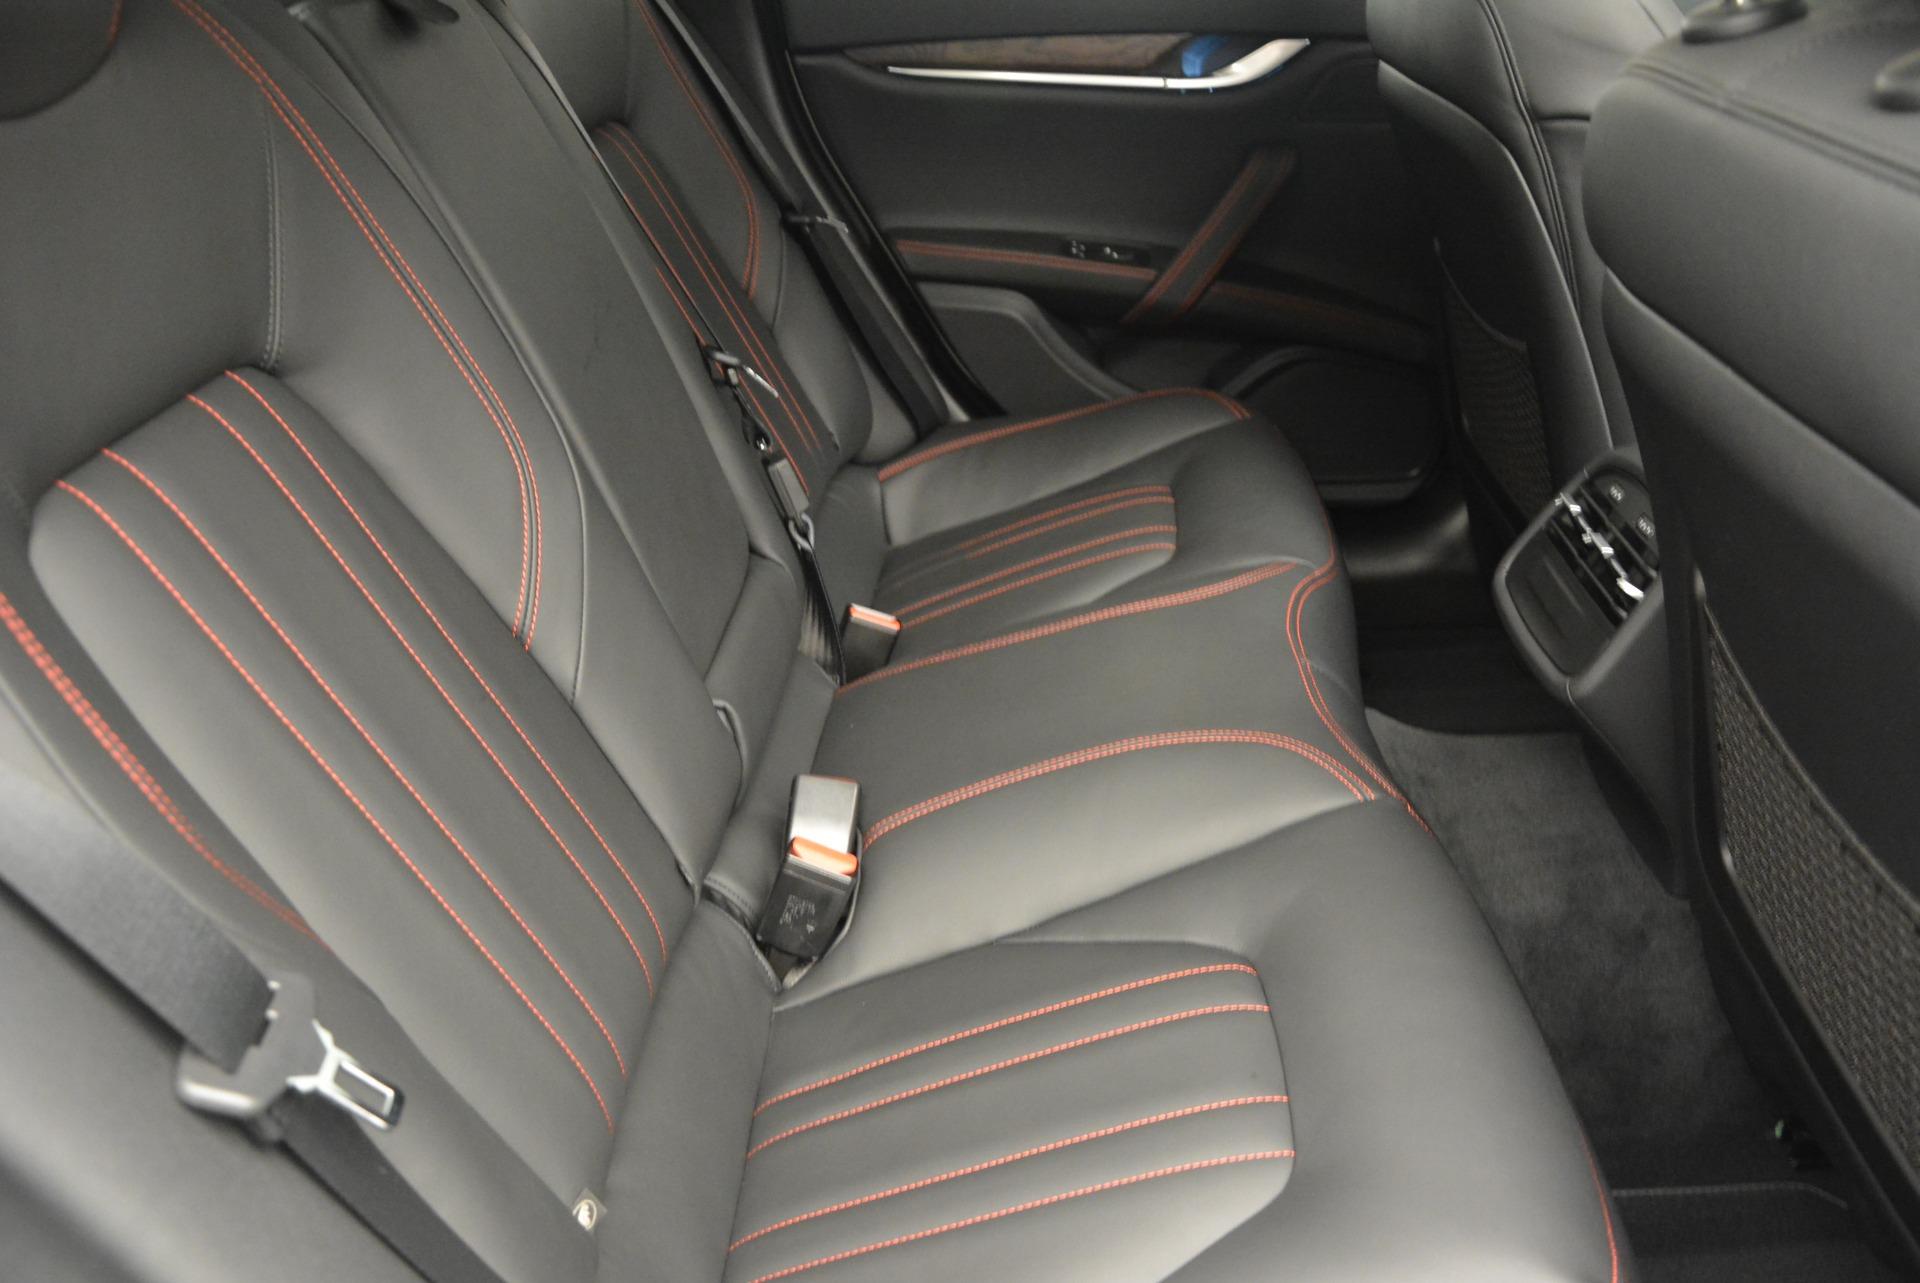 Used 2016 Maserati Ghibli S Q4  EX-LOANER For Sale In Greenwich, CT. Alfa Romeo of Greenwich, W252 669_p23